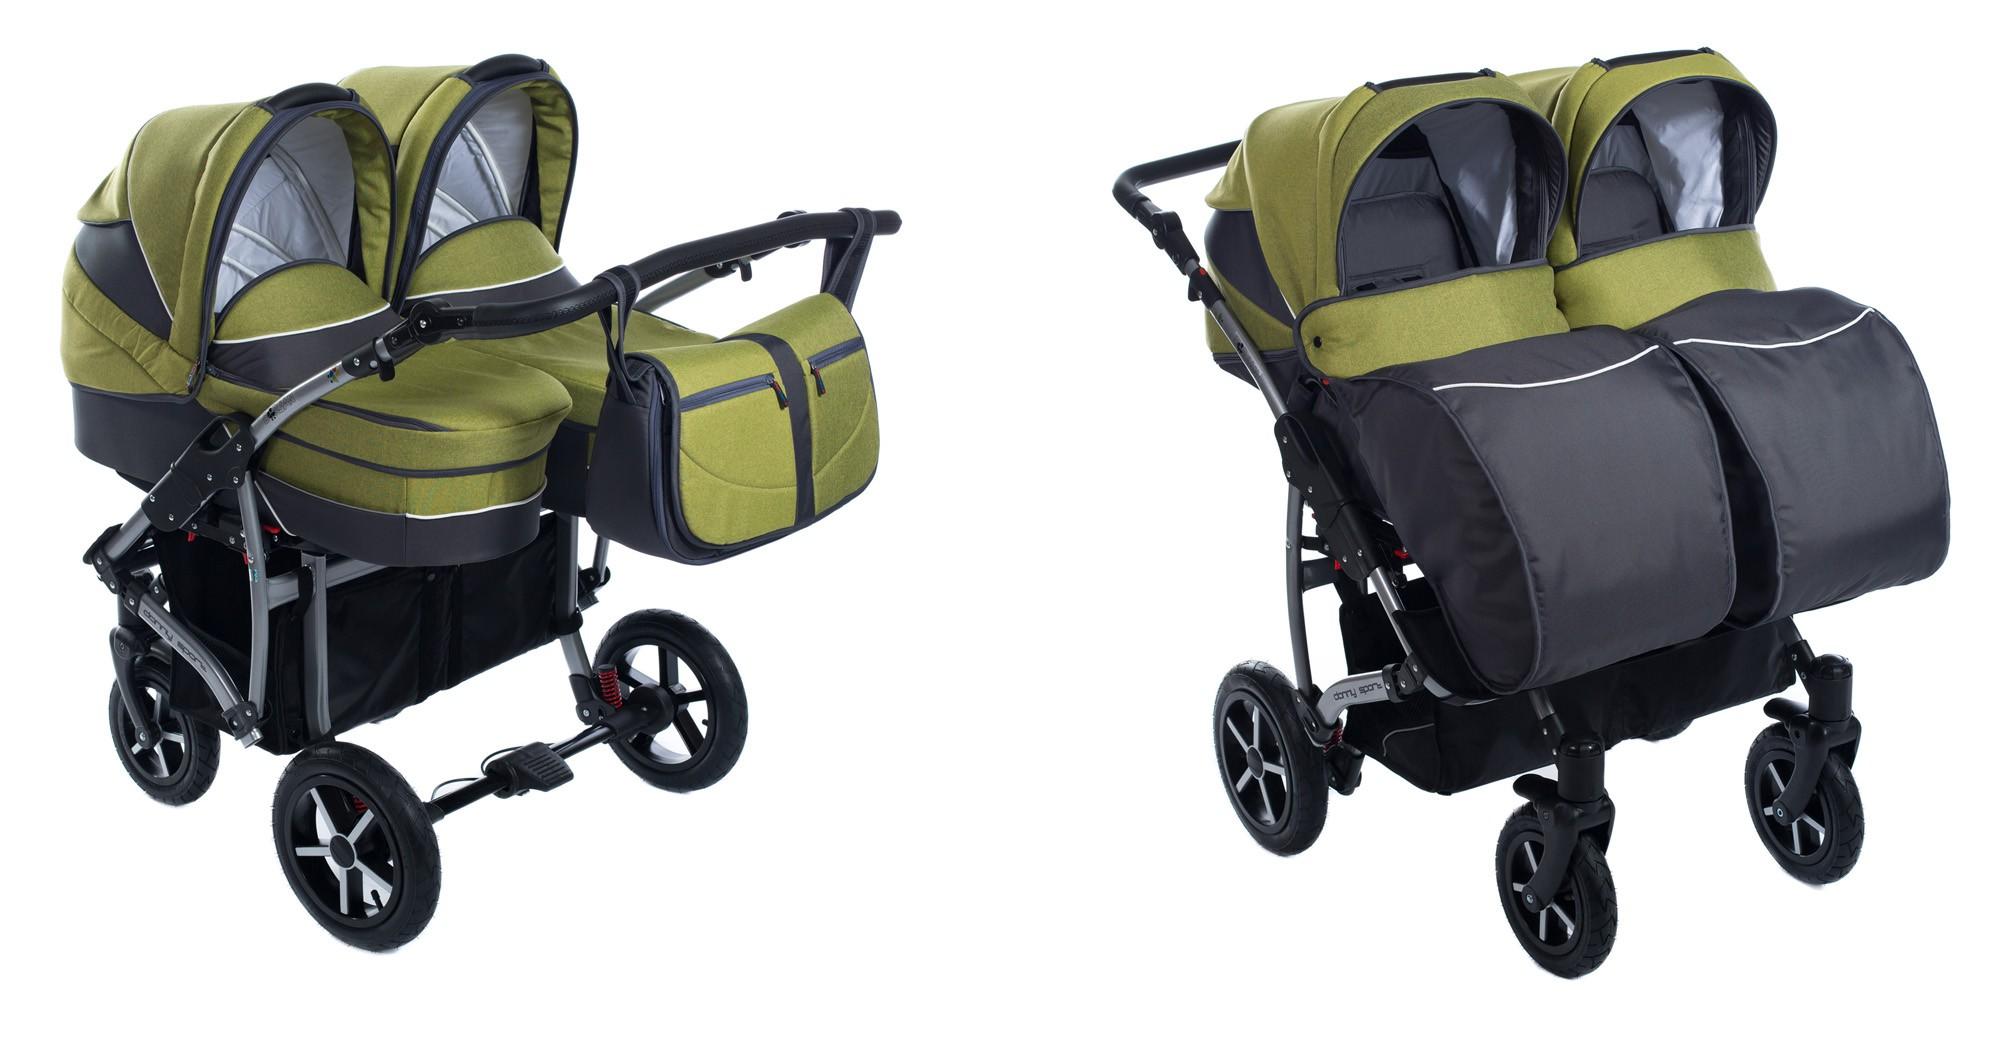 3in1 kombi zwillingskinderwagen 2x babywanne buggy. Black Bedroom Furniture Sets. Home Design Ideas